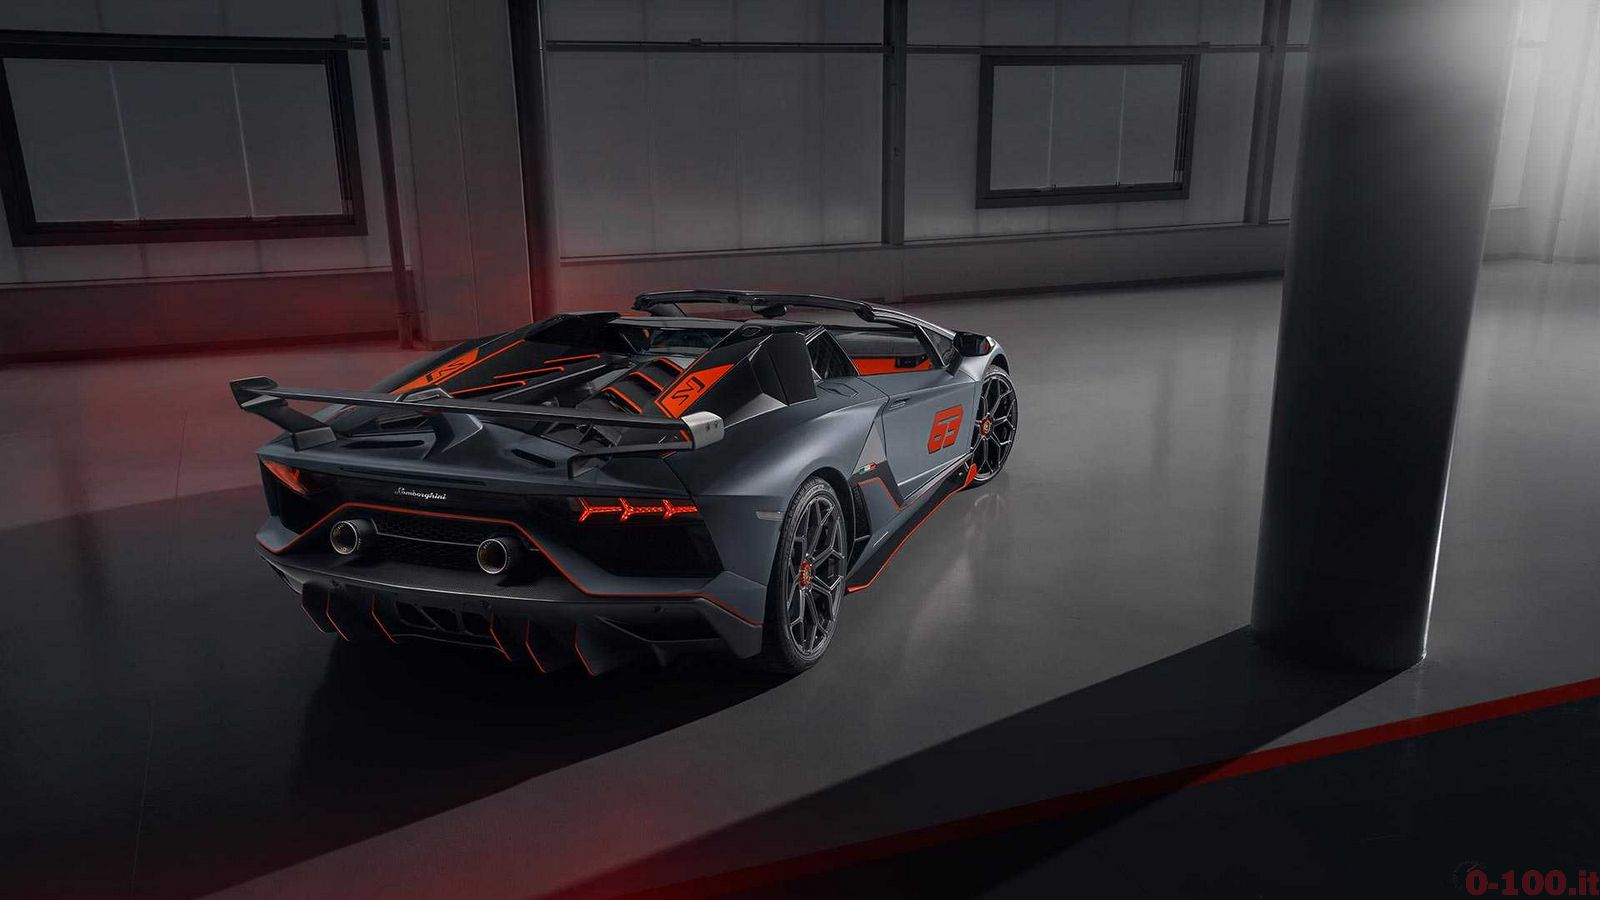 Lamborghini_Aventador_SVJ_63_Roadster_0-100_1